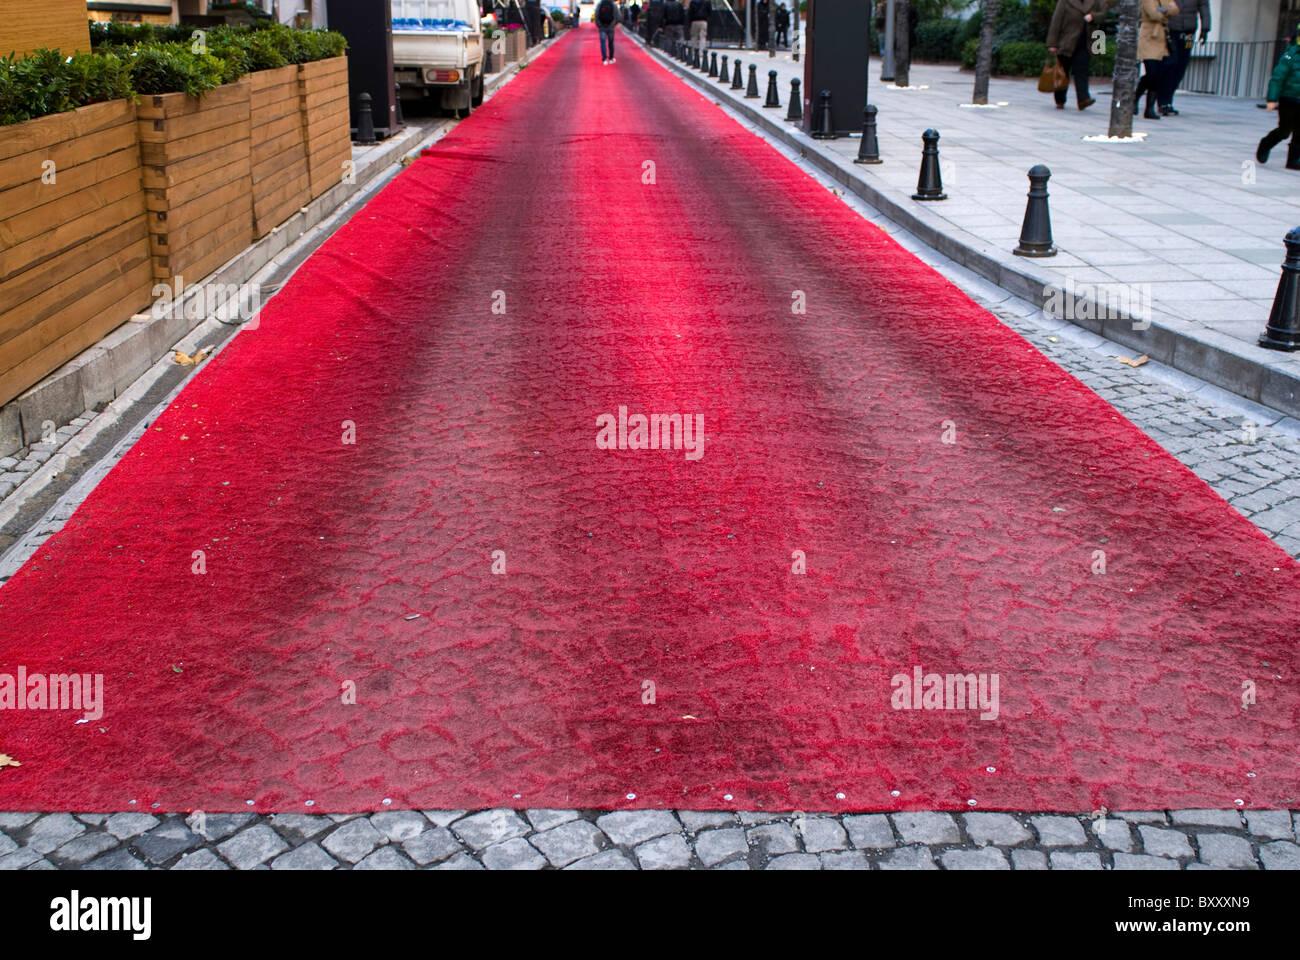 red carpet on street - Stock Image